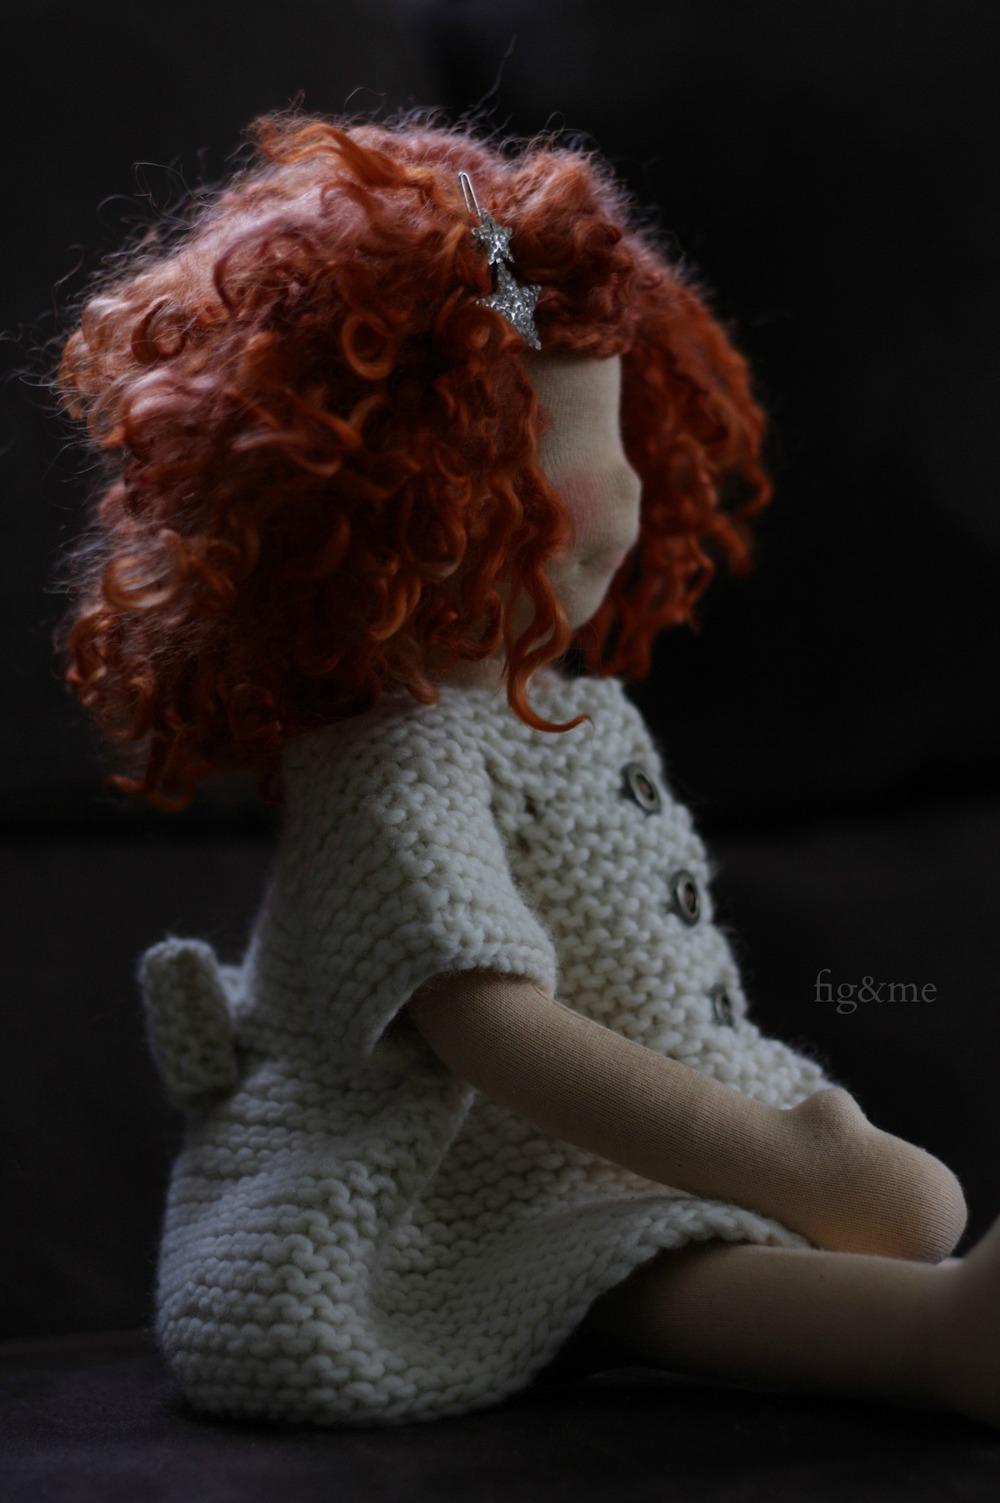 Ewa, a petite doll by Fig & me.